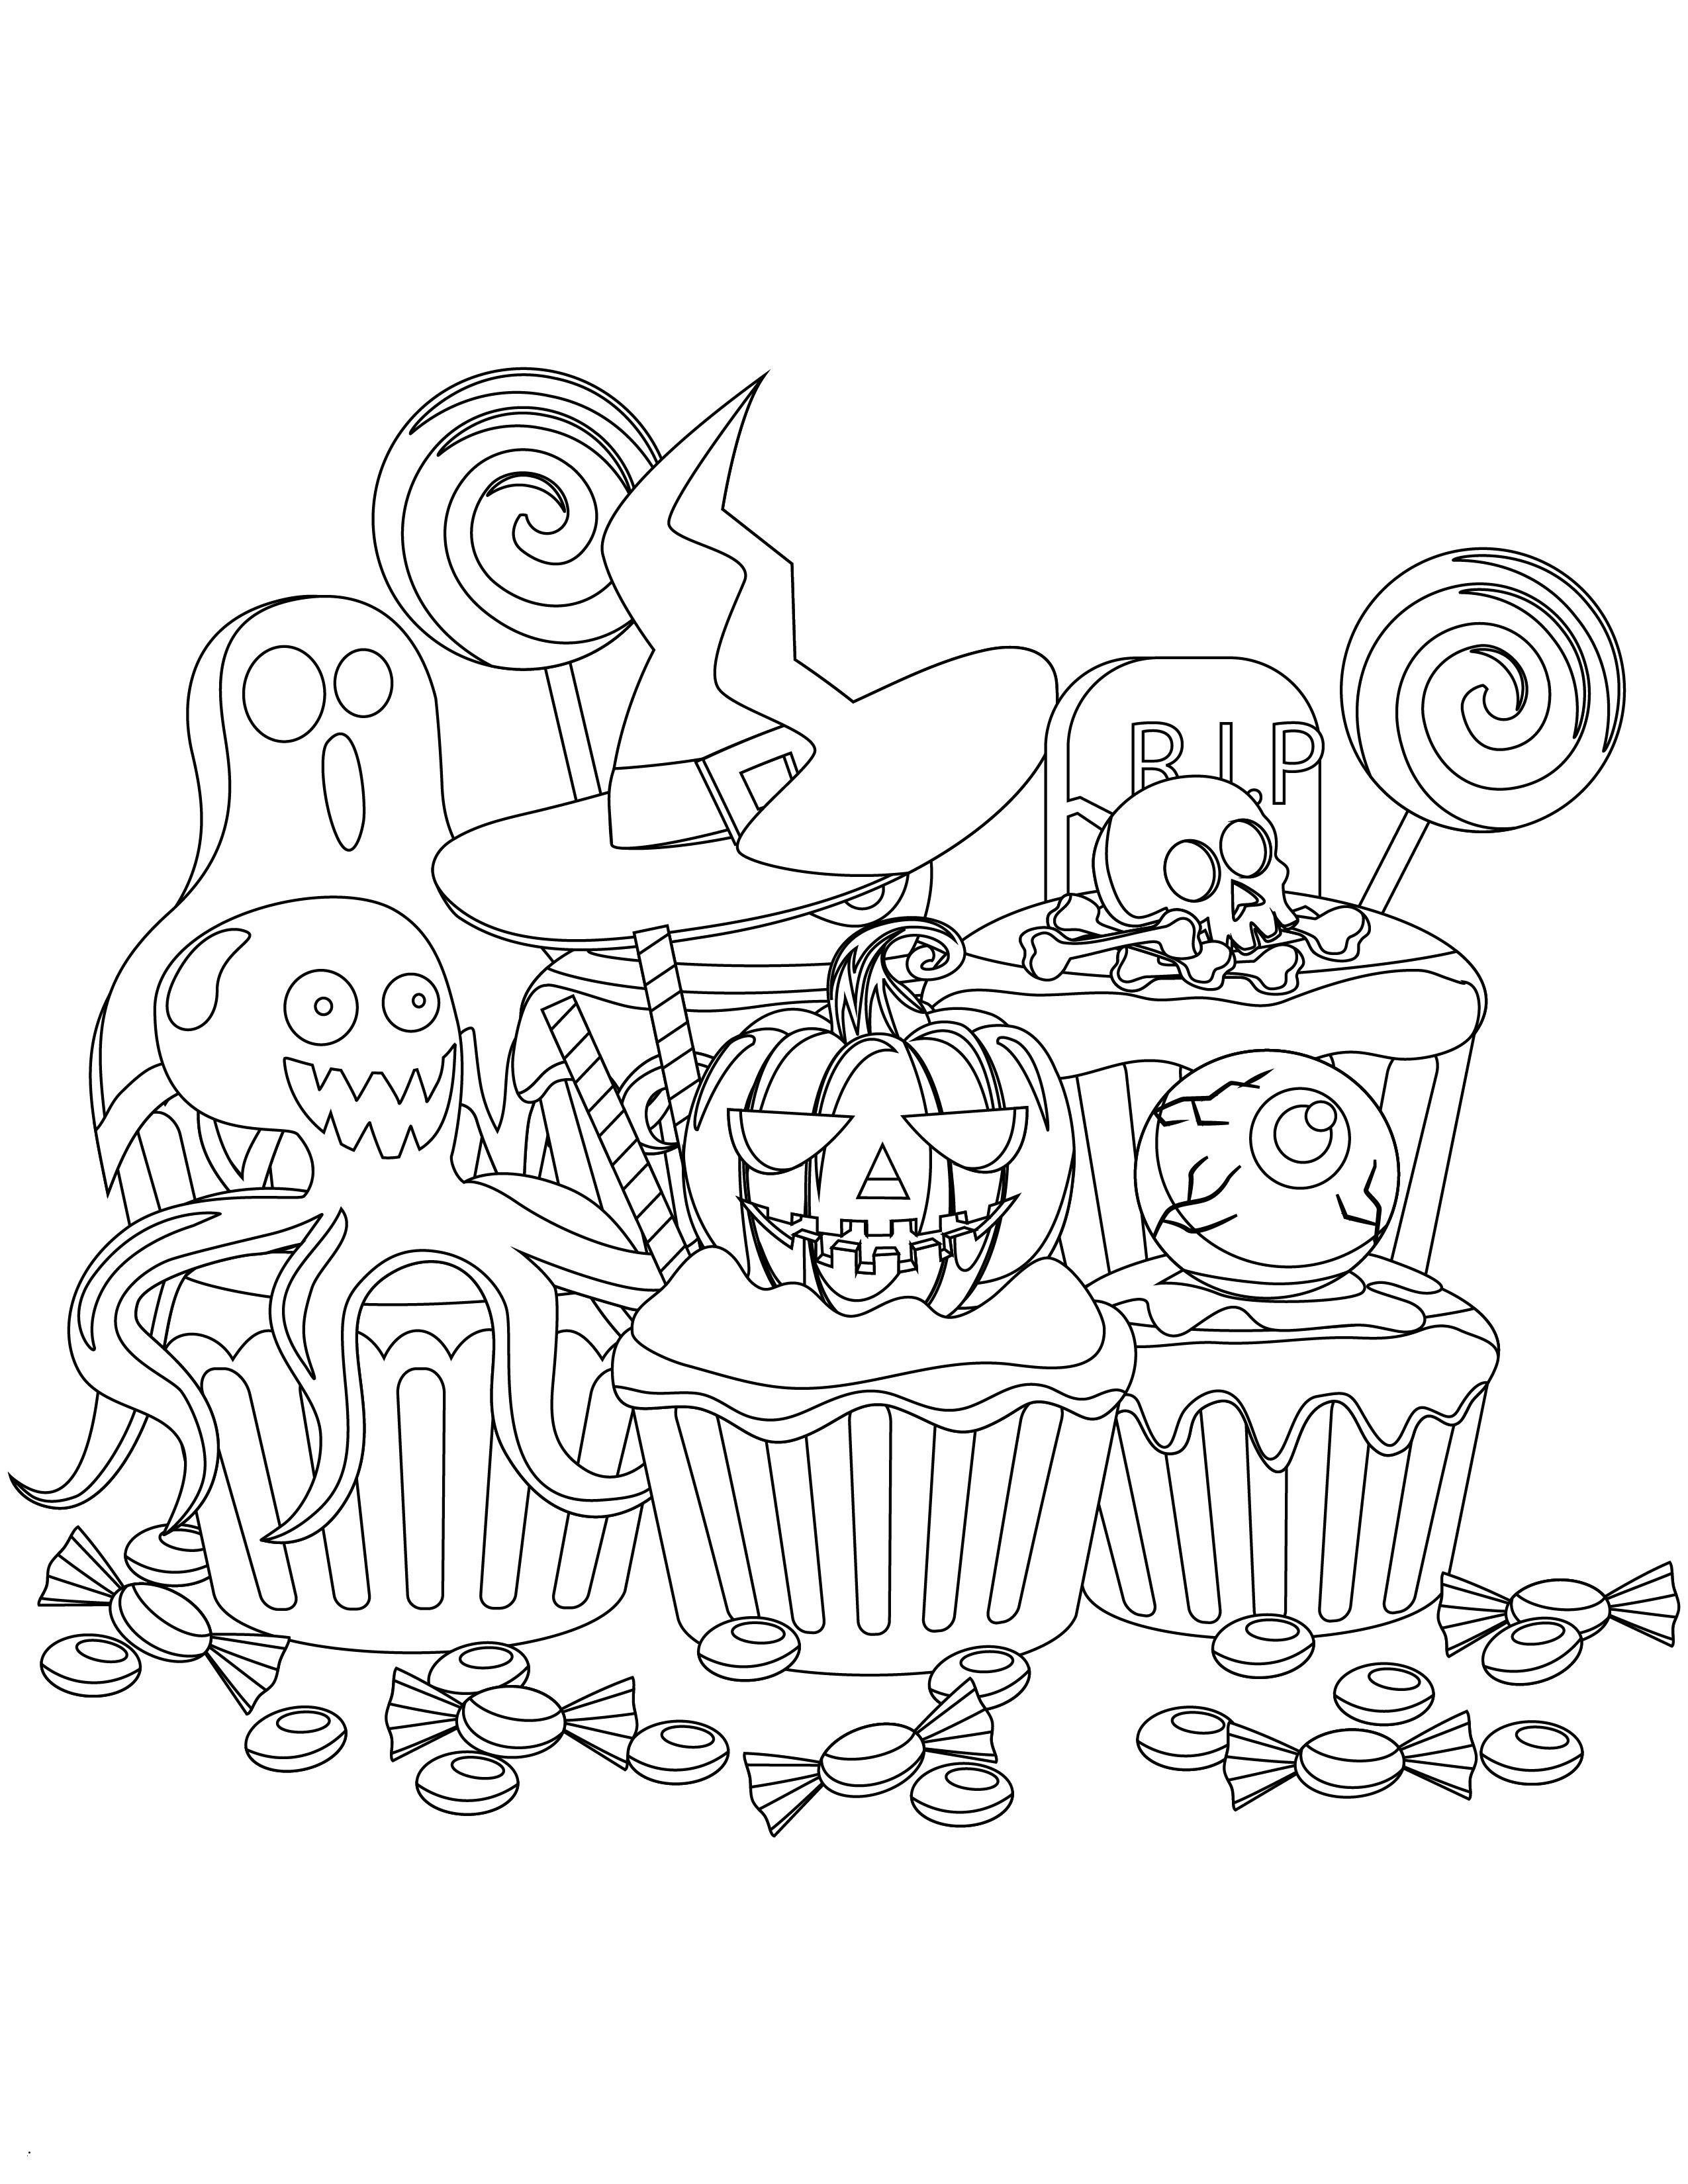 Monster High Zum Ausmalen Einzigartig 48 formular Ausmalbilder Ever after High Treehouse Nyc Sammlung